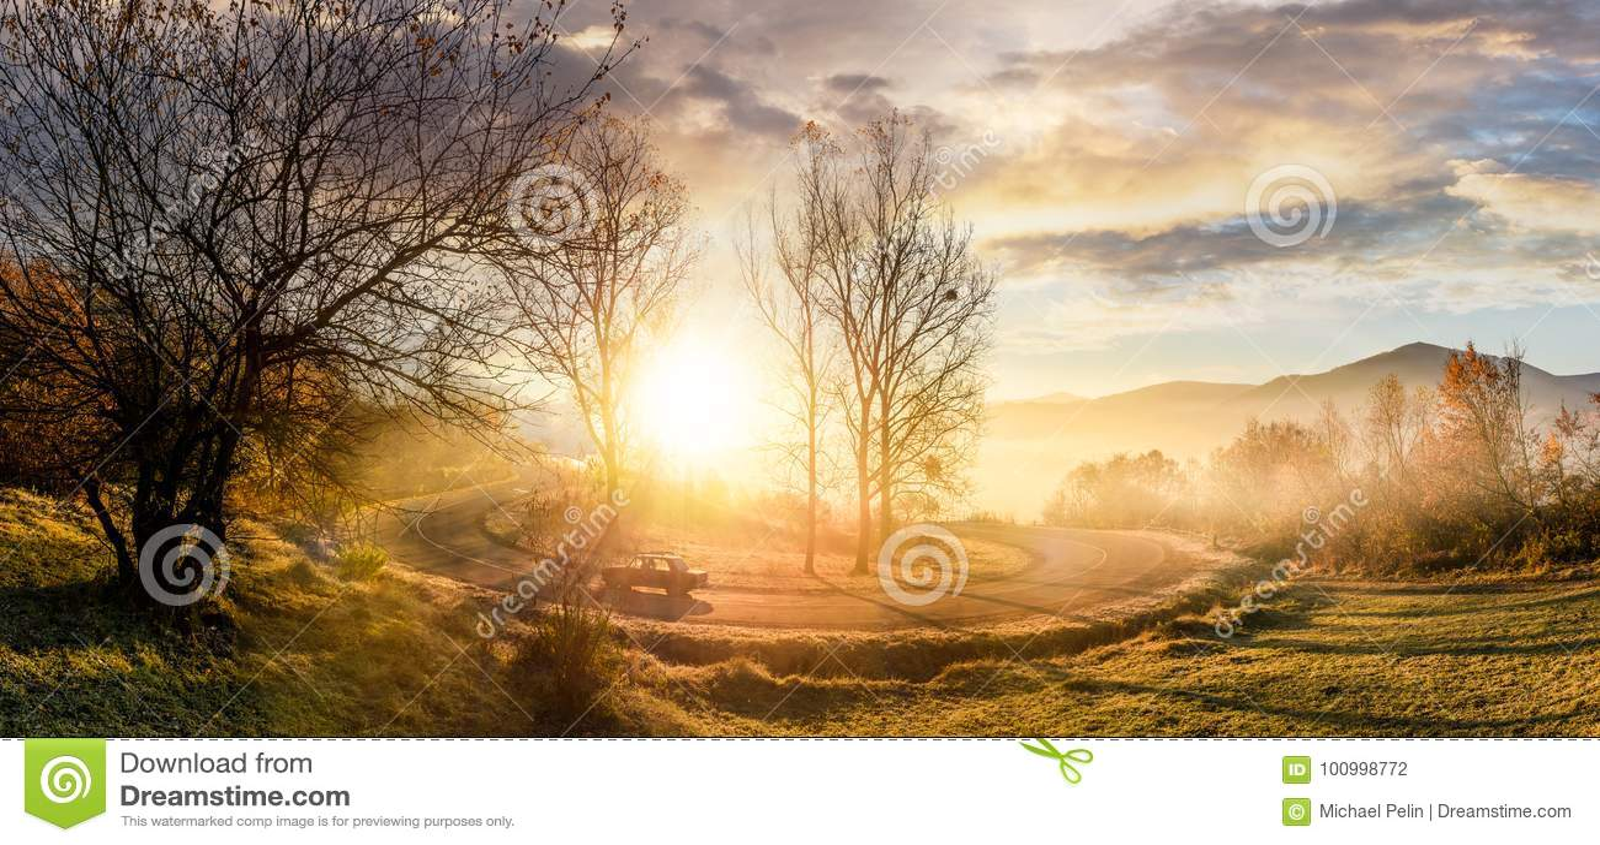 Serpentine turnaround on foggy sunrise